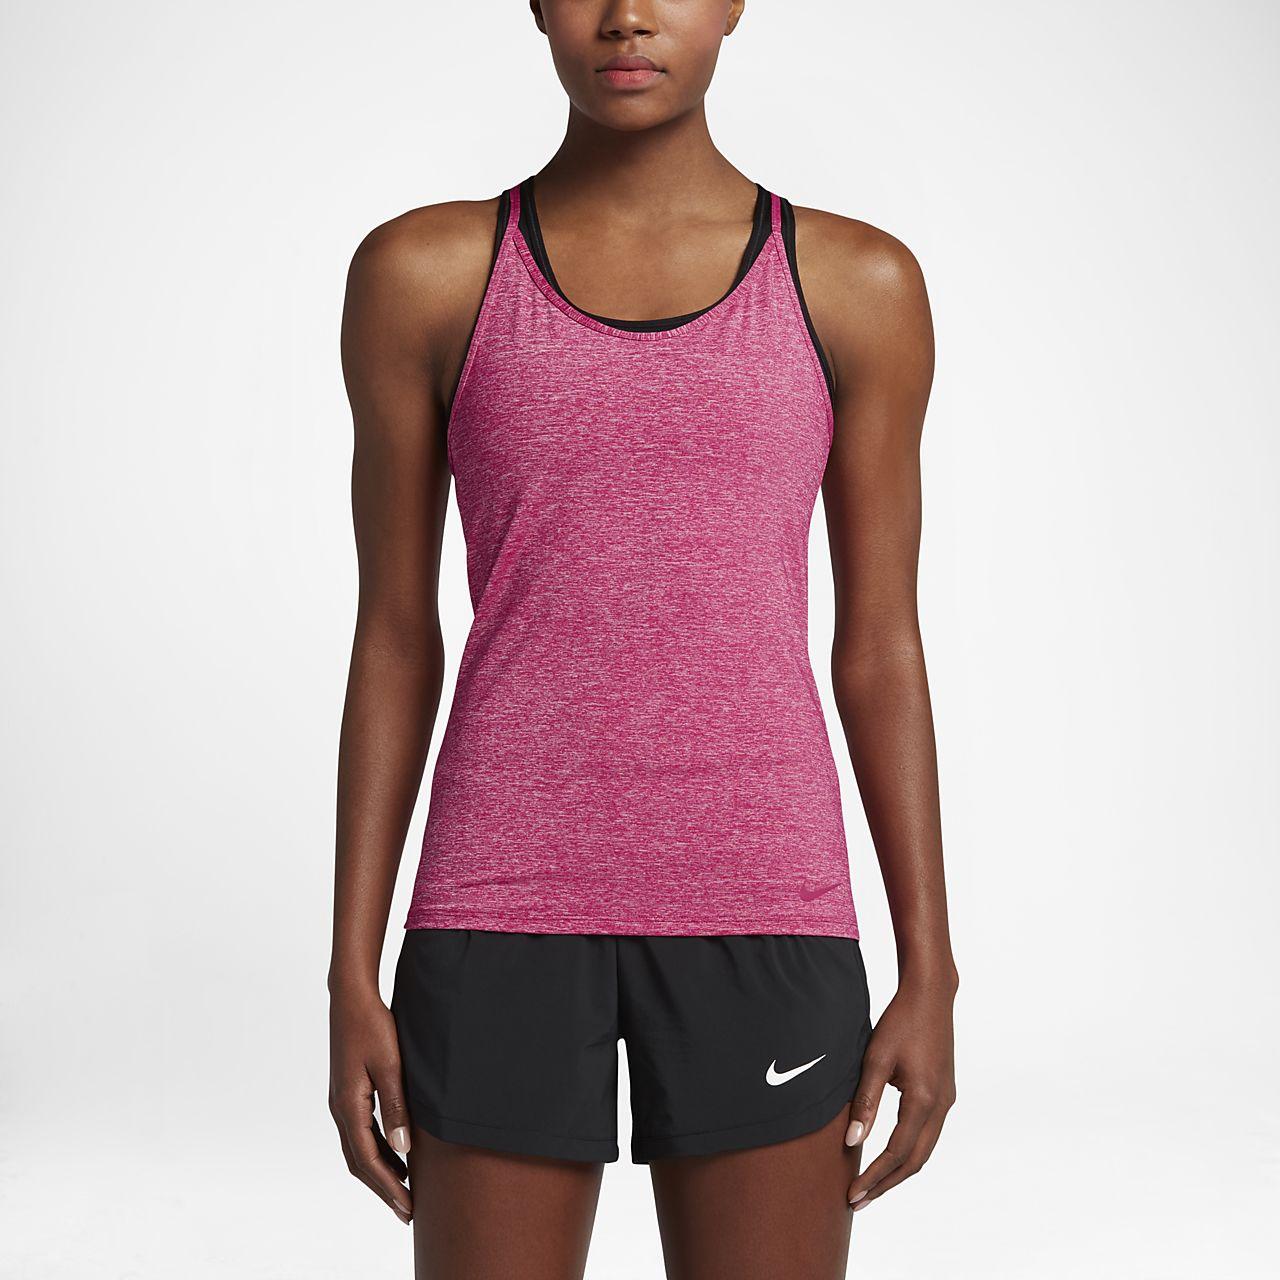 Nike Women's Training Tank Tops Sport Fuchsia